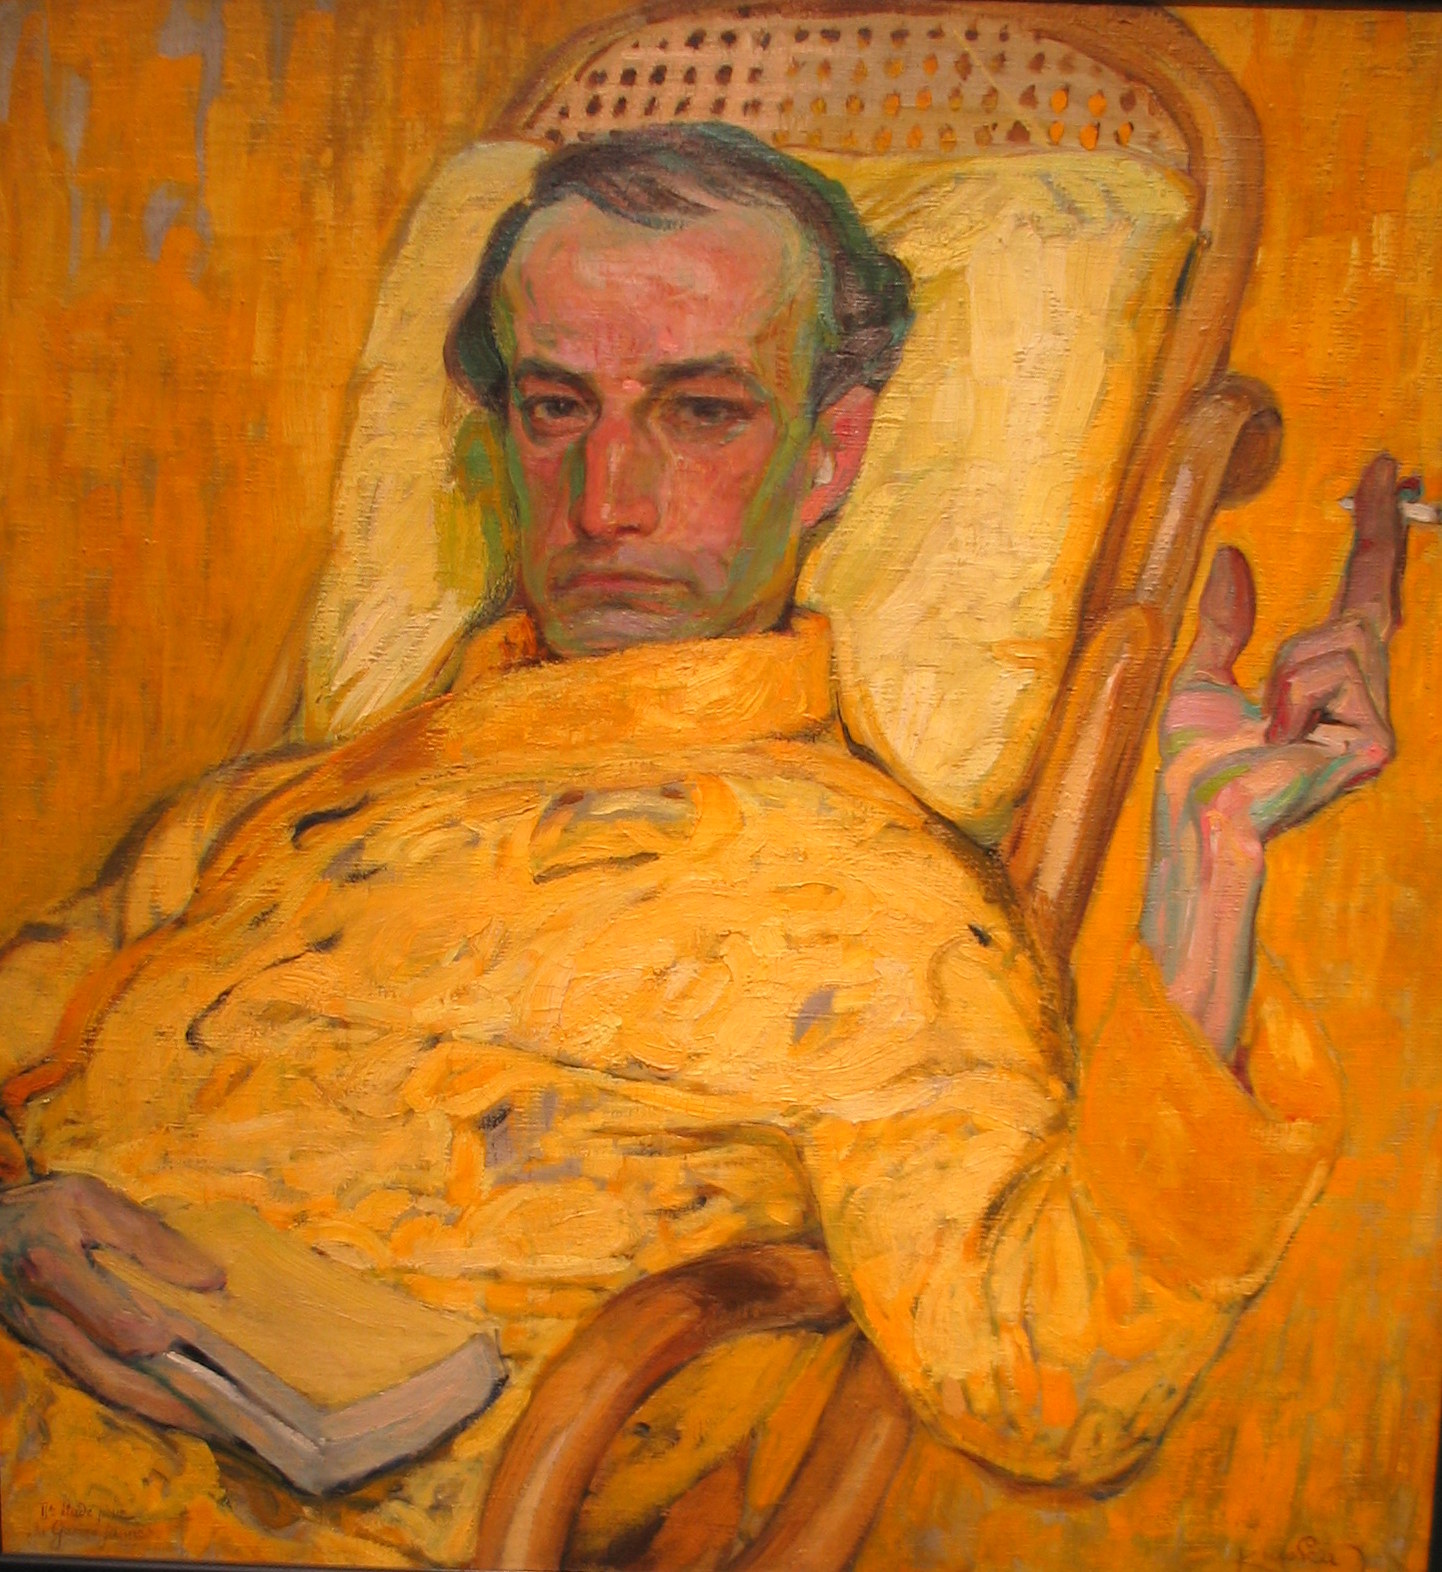 Frantisek Kupka, 1871-1957.  The painting is in Houston.